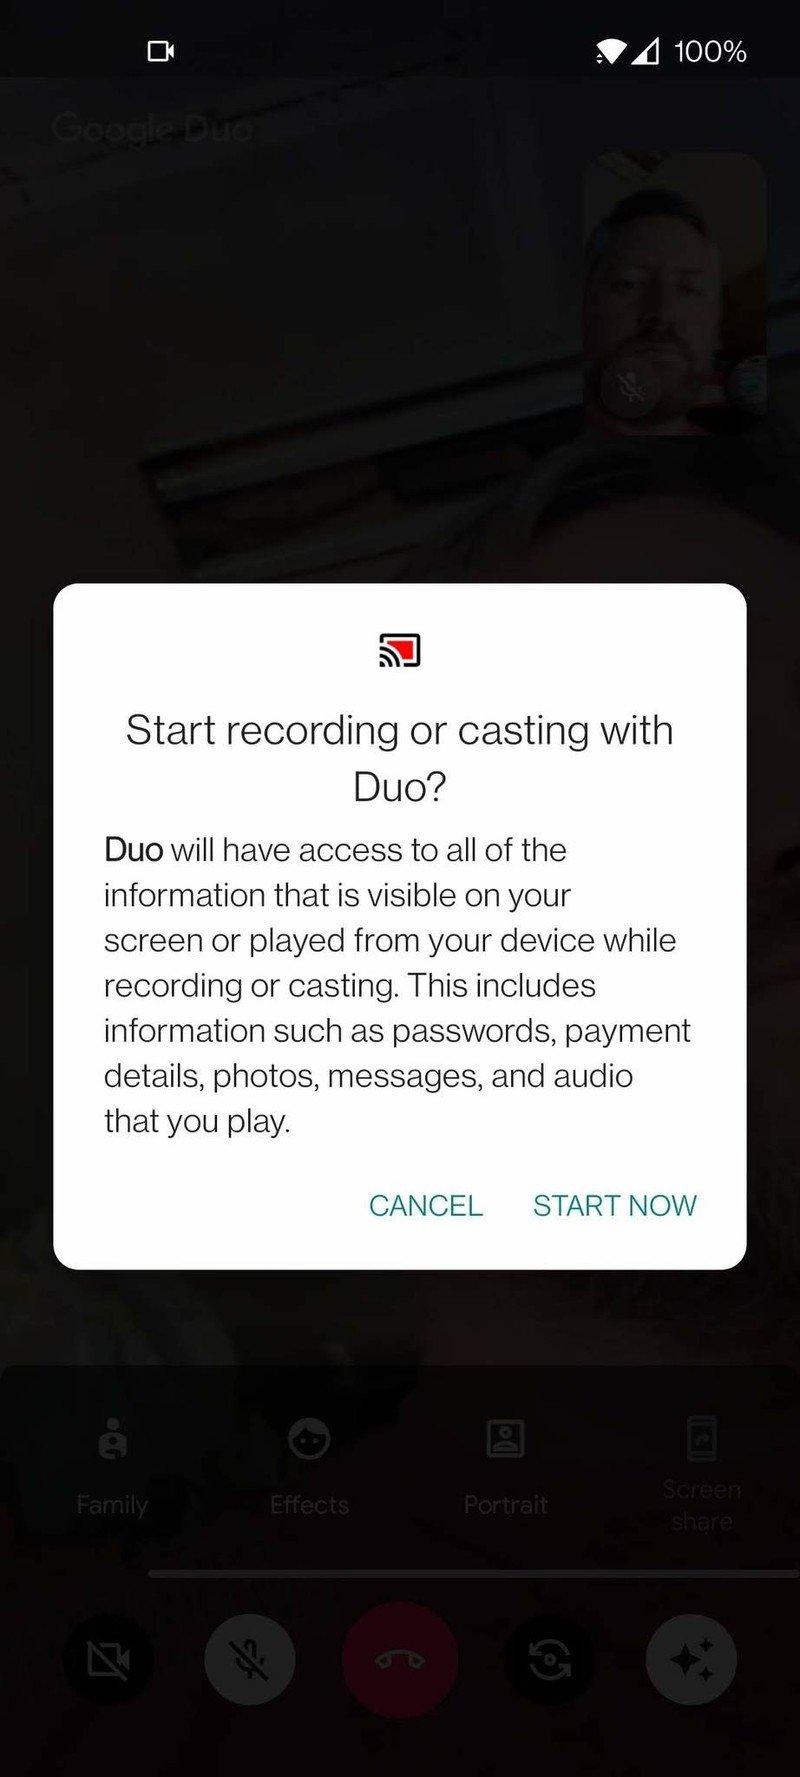 google-duo-screen-share-screenshot-05-1.jpg